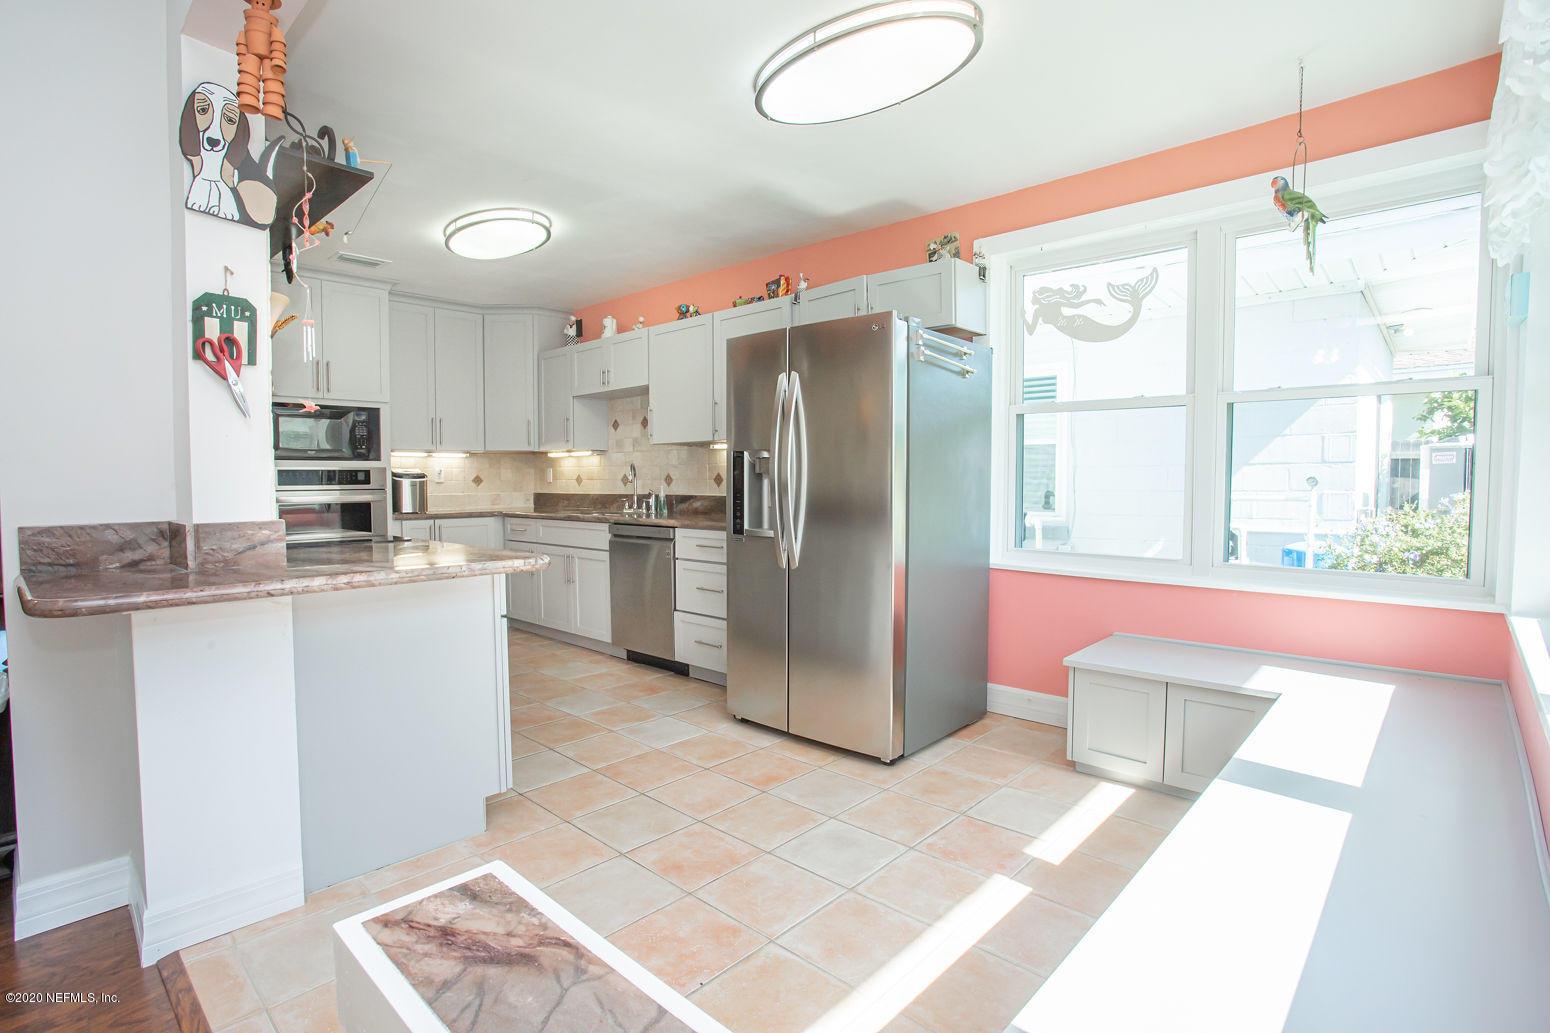 329 ARPIEKA, ST AUGUSTINE, FLORIDA 32080, 4 Bedrooms Bedrooms, ,2 BathroomsBathrooms,Residential,For sale,ARPIEKA,1081104